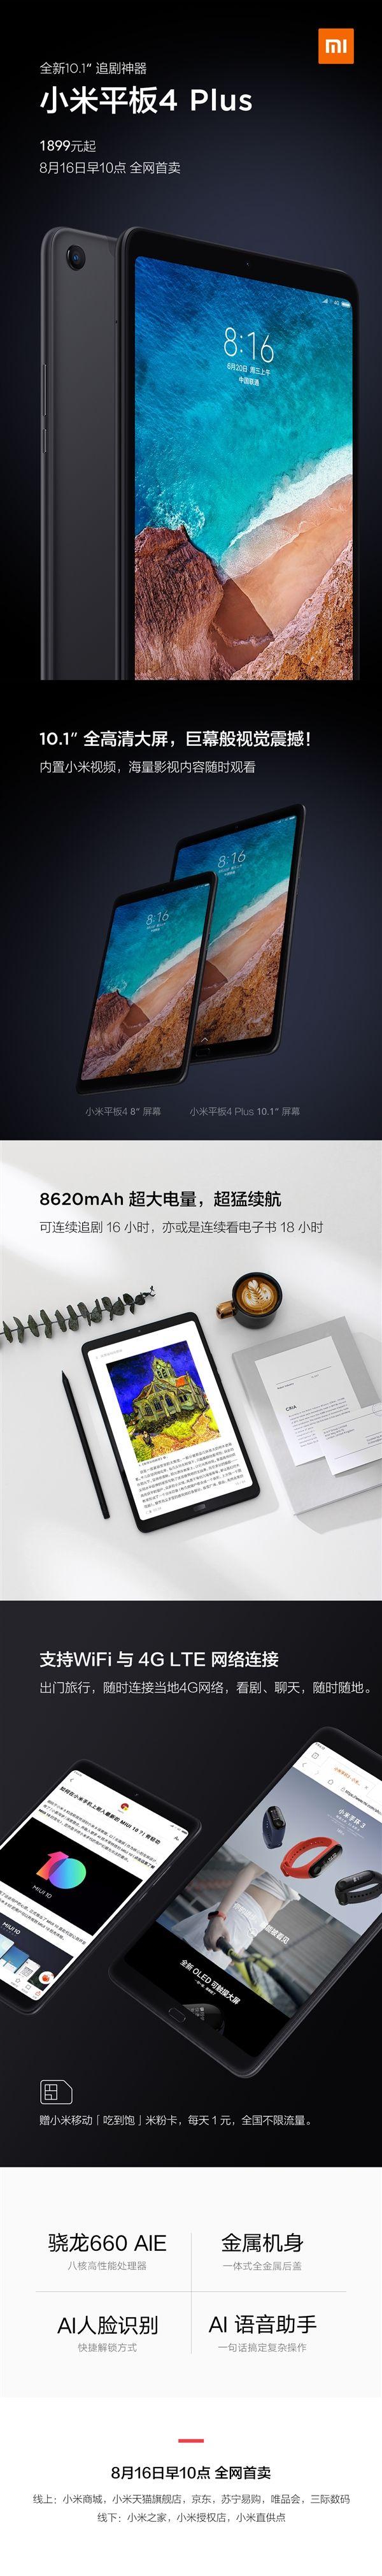 Представлен Xiaomi Mi Pad 4 Plus: 10,1-дюймовый дисплей и батарейка на 8620 мАч – фото 2